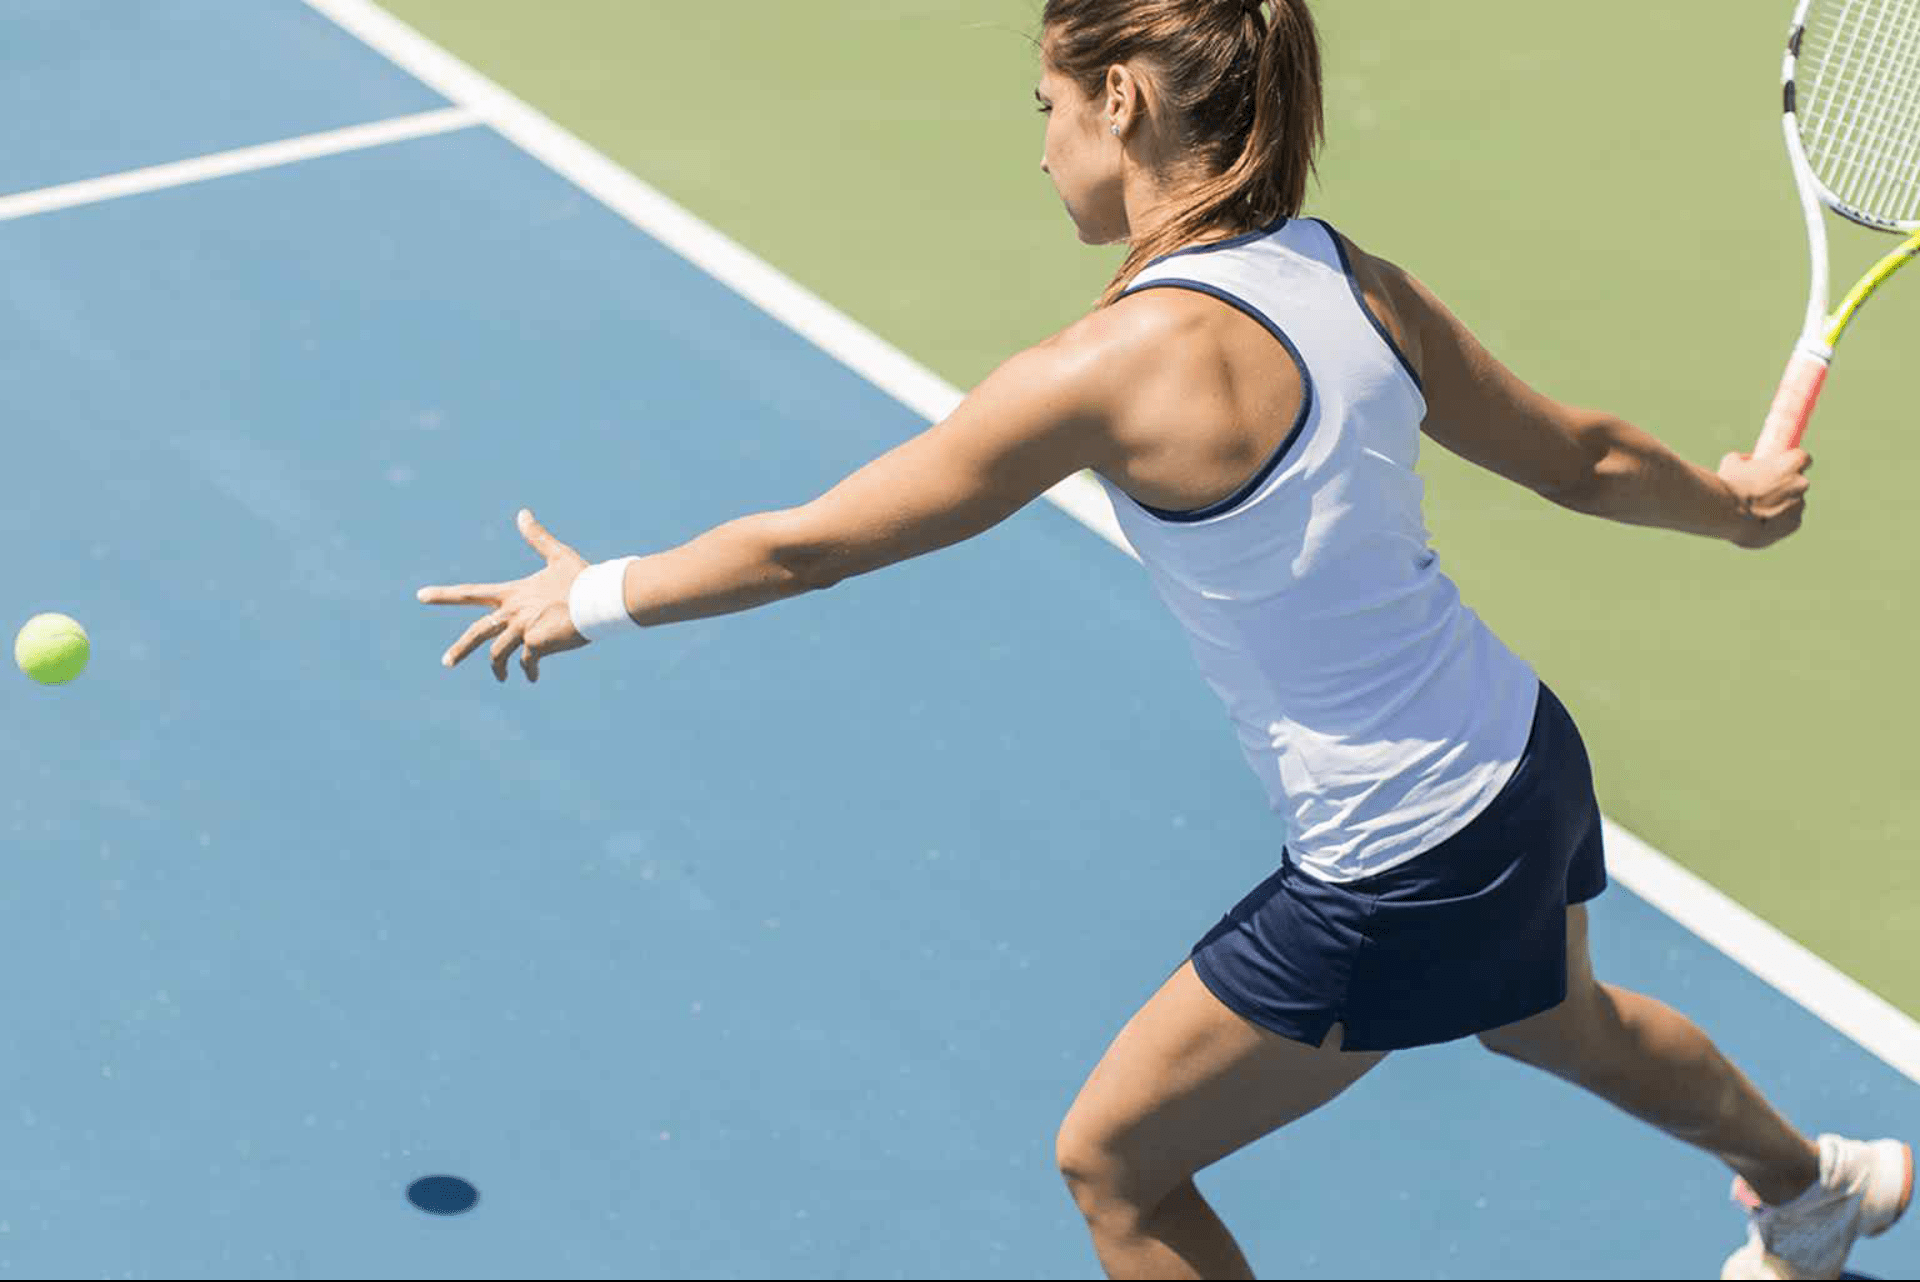 https://www.tennisexcellence.com.au/wp-content/uploads/2020/03/Programs_PrivateLessons-1-e1583320770149.png